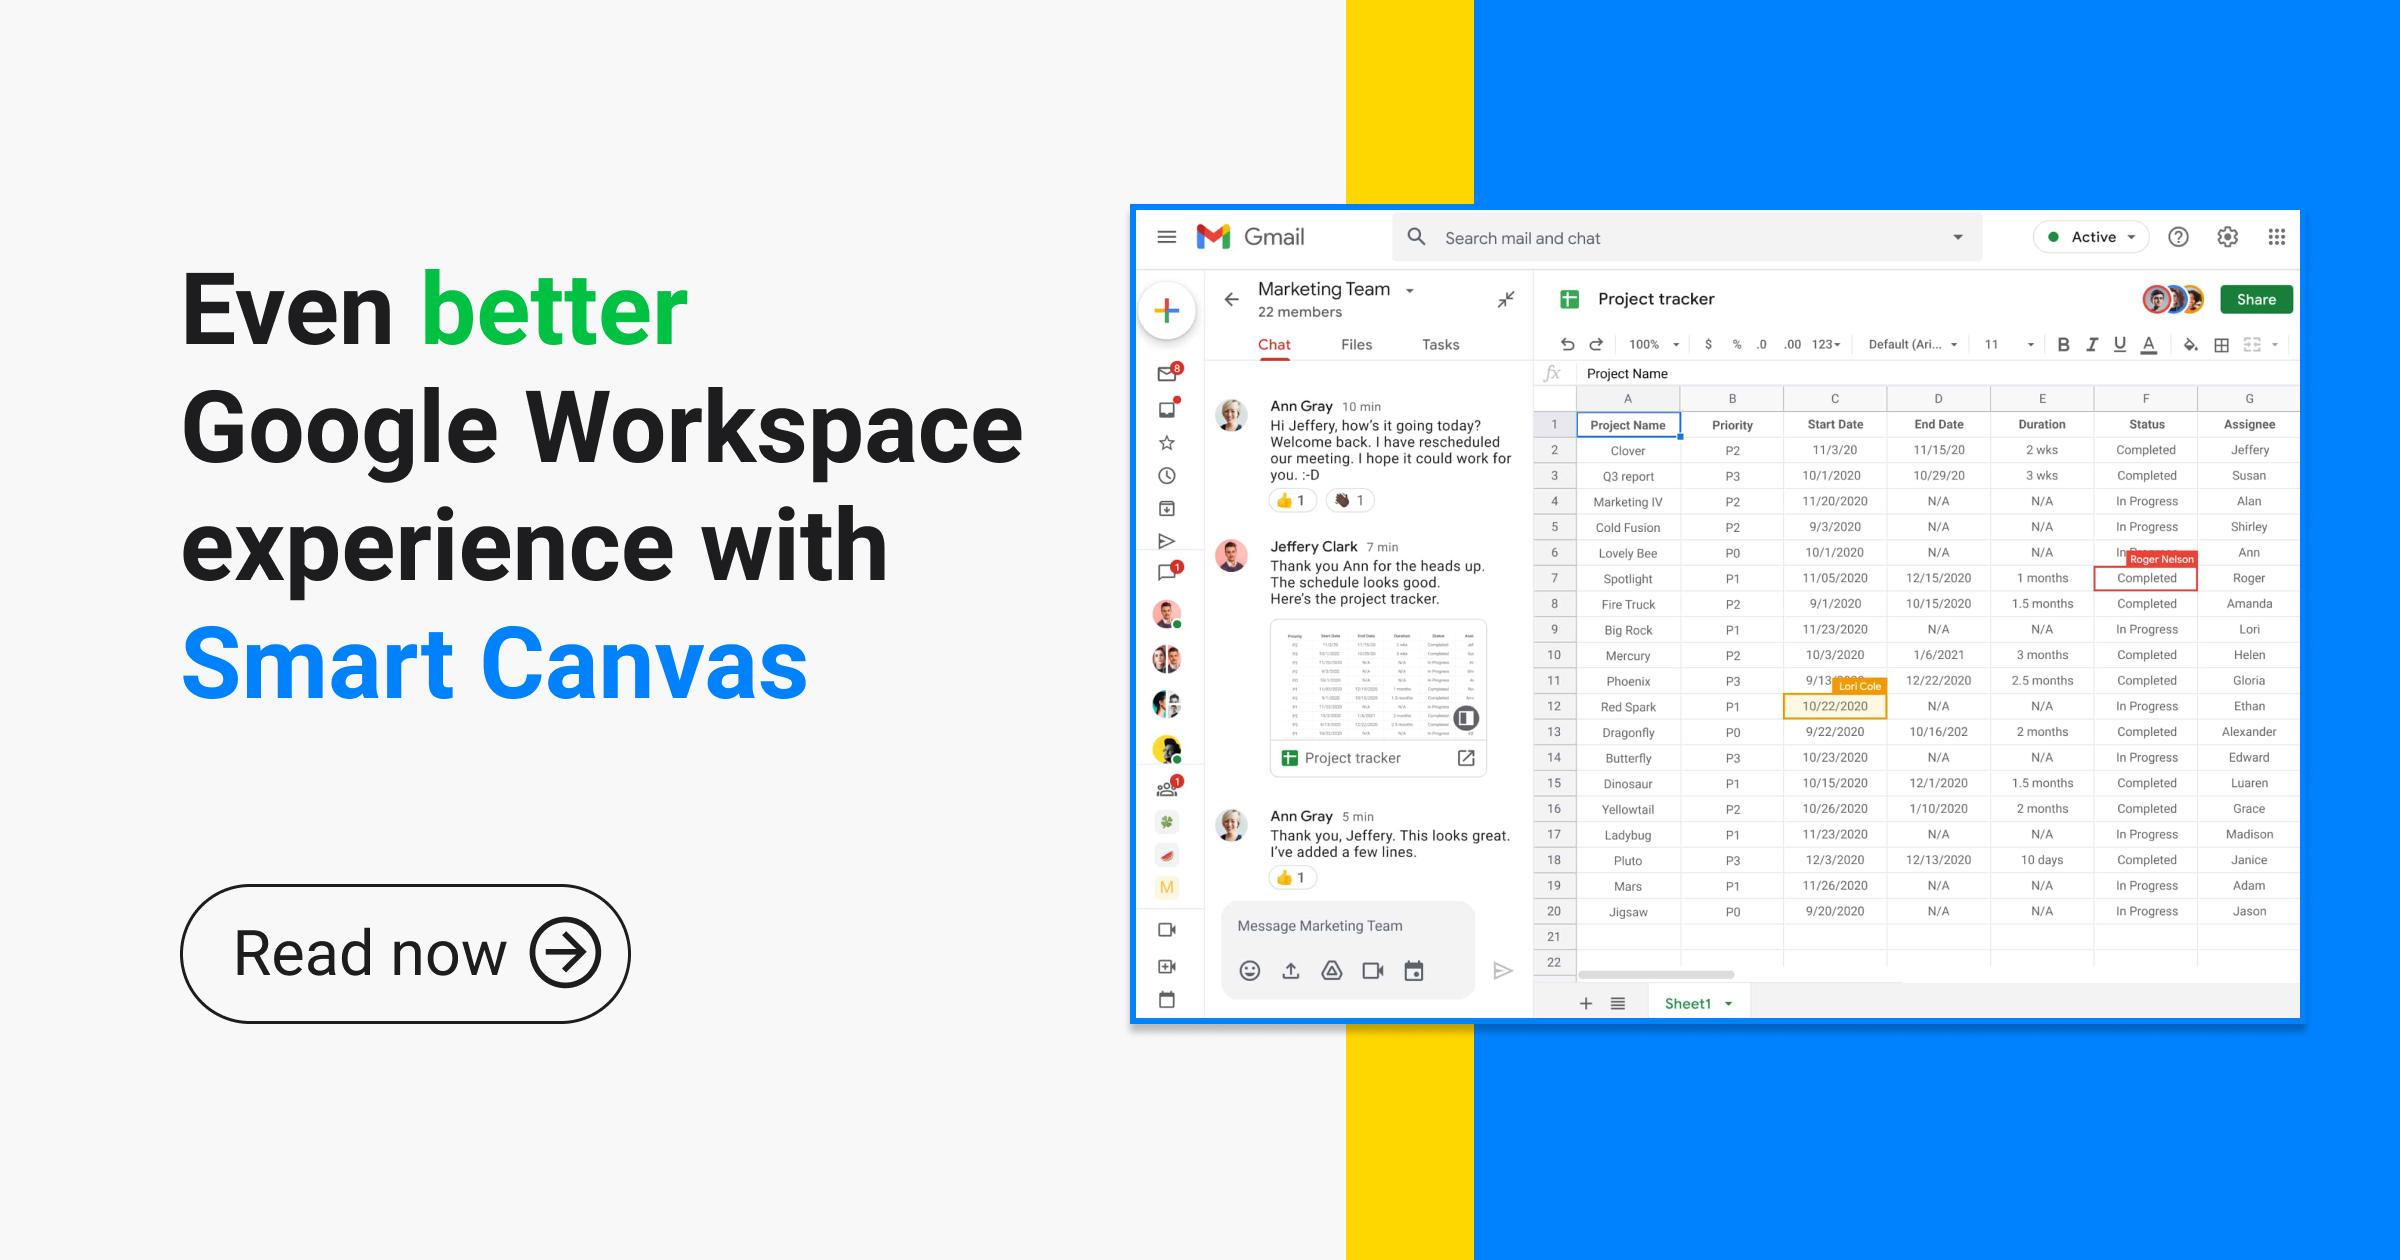 Blogpost_ Even better Google Workspace with Smart Canvas (1)